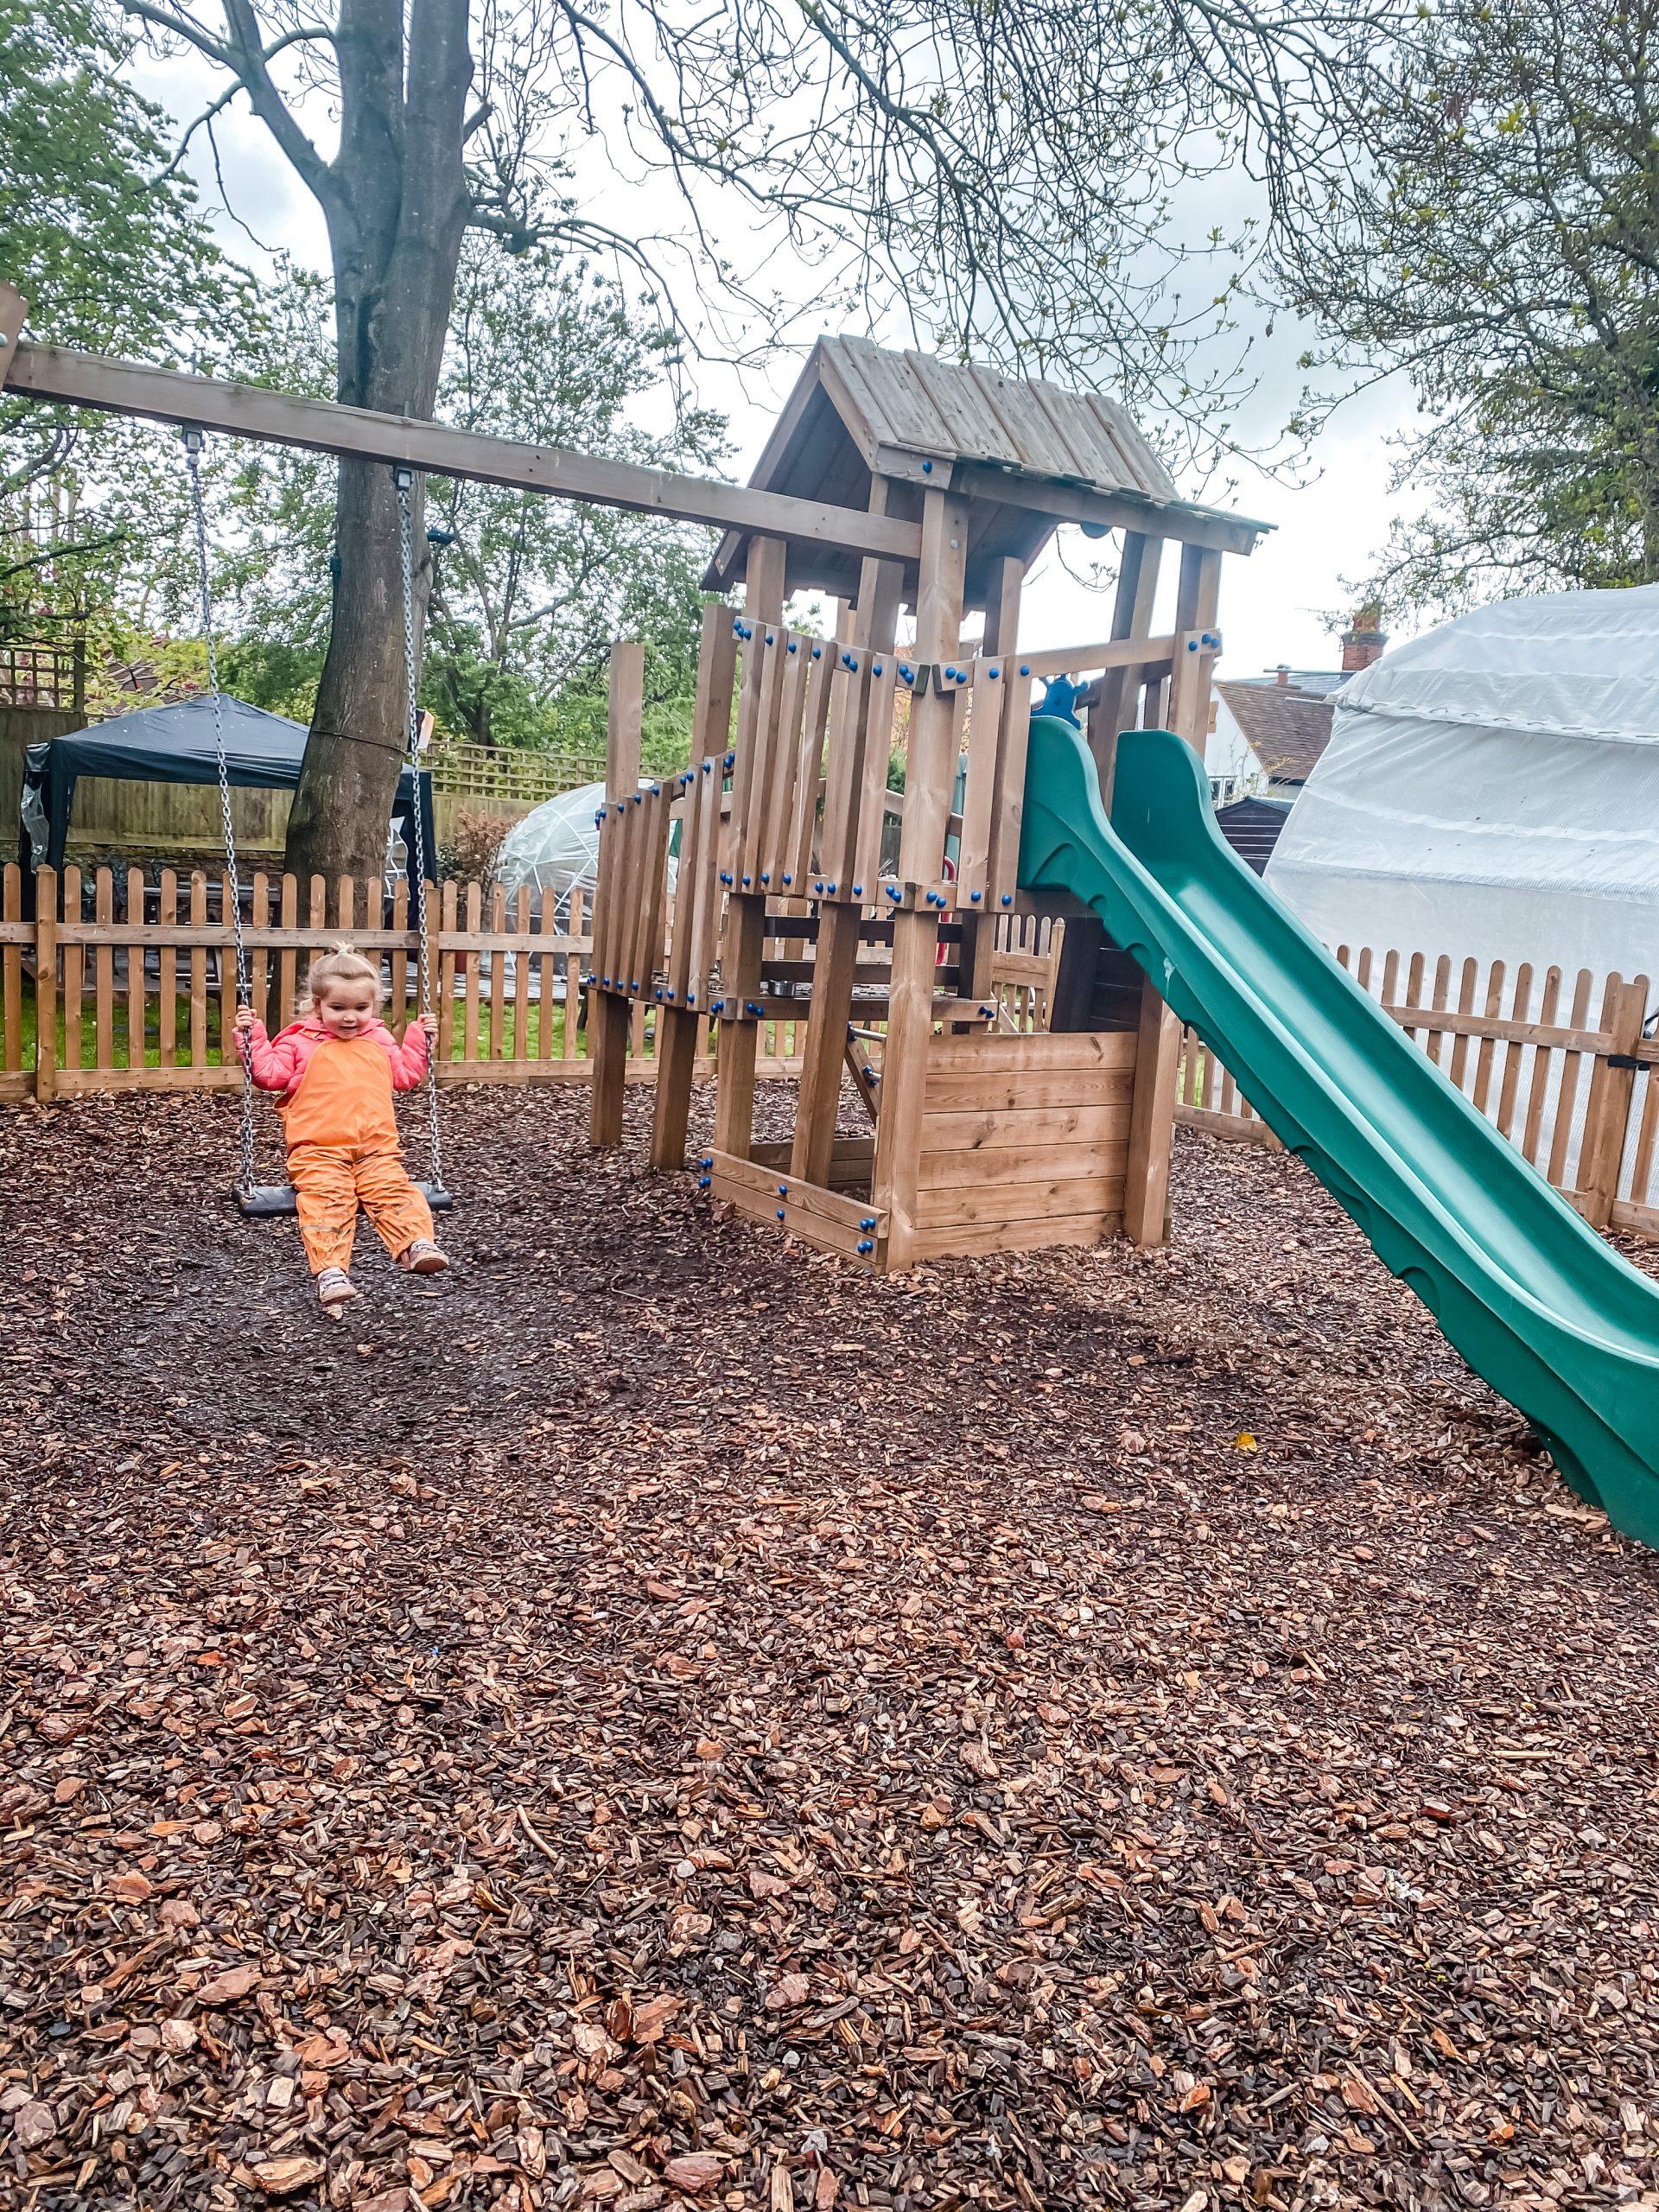 Playground at Gray's Inn in Wooburn Green